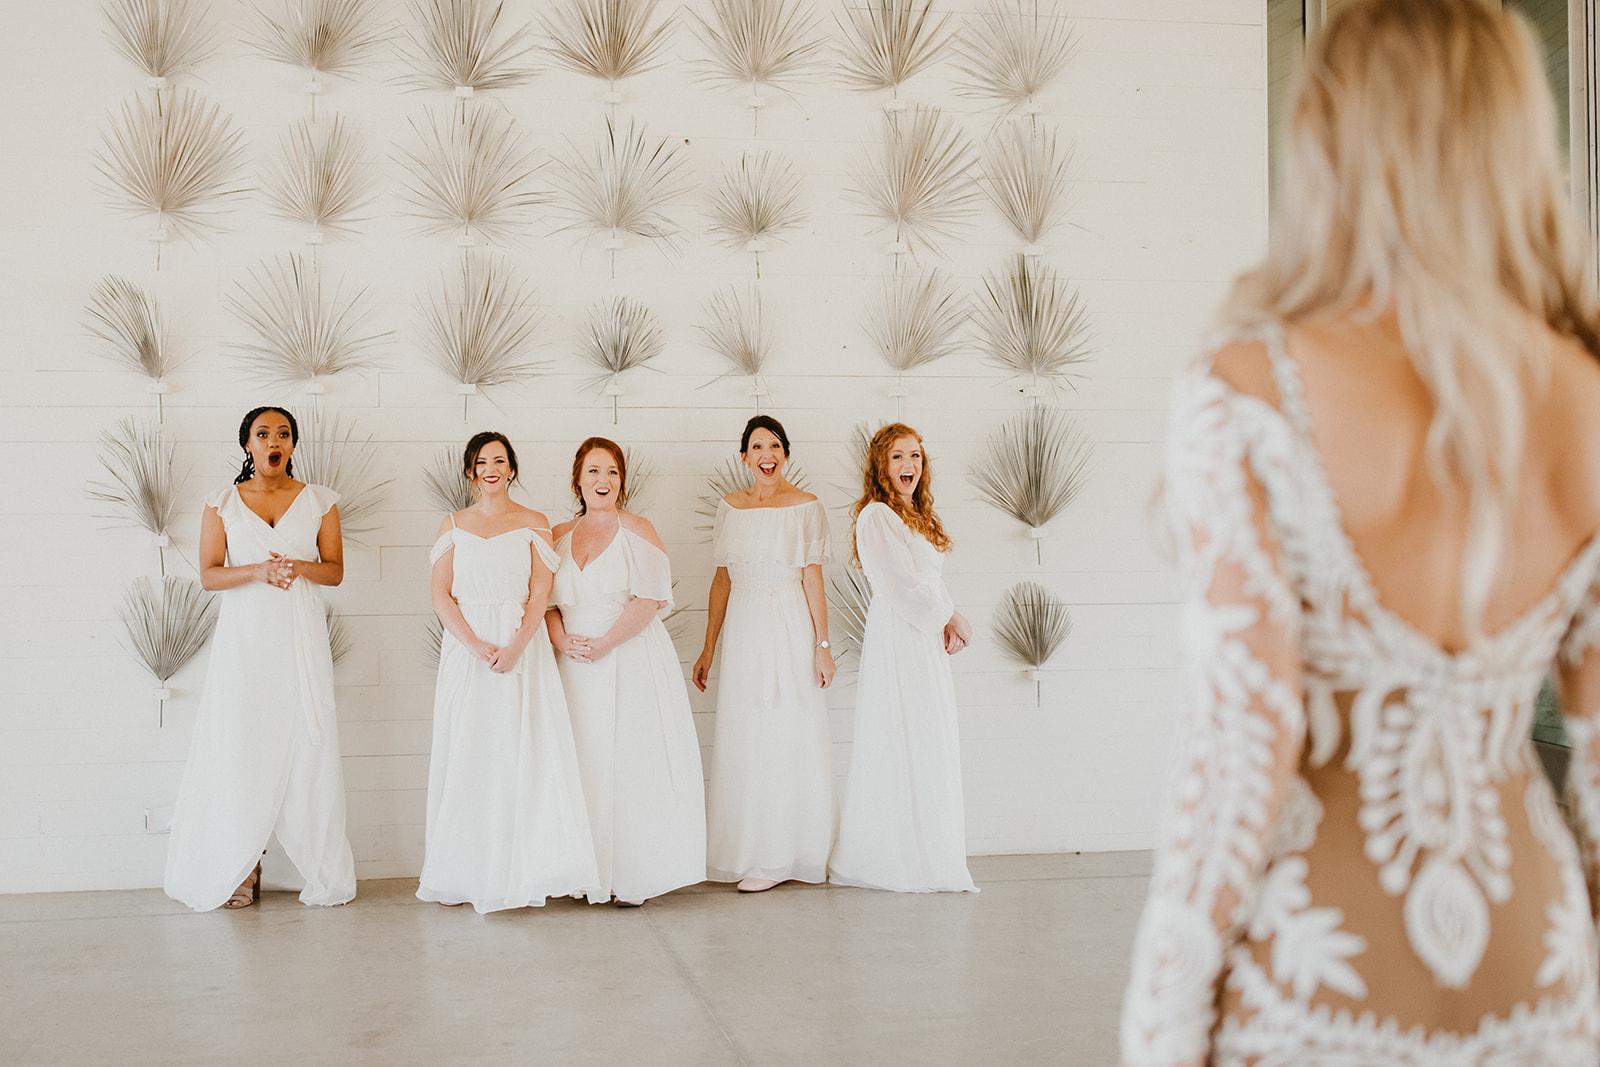 bridesmaid first look on wedding day + prospect house wedding venue + wedding coordinator epoch co + telluride photographer century tree